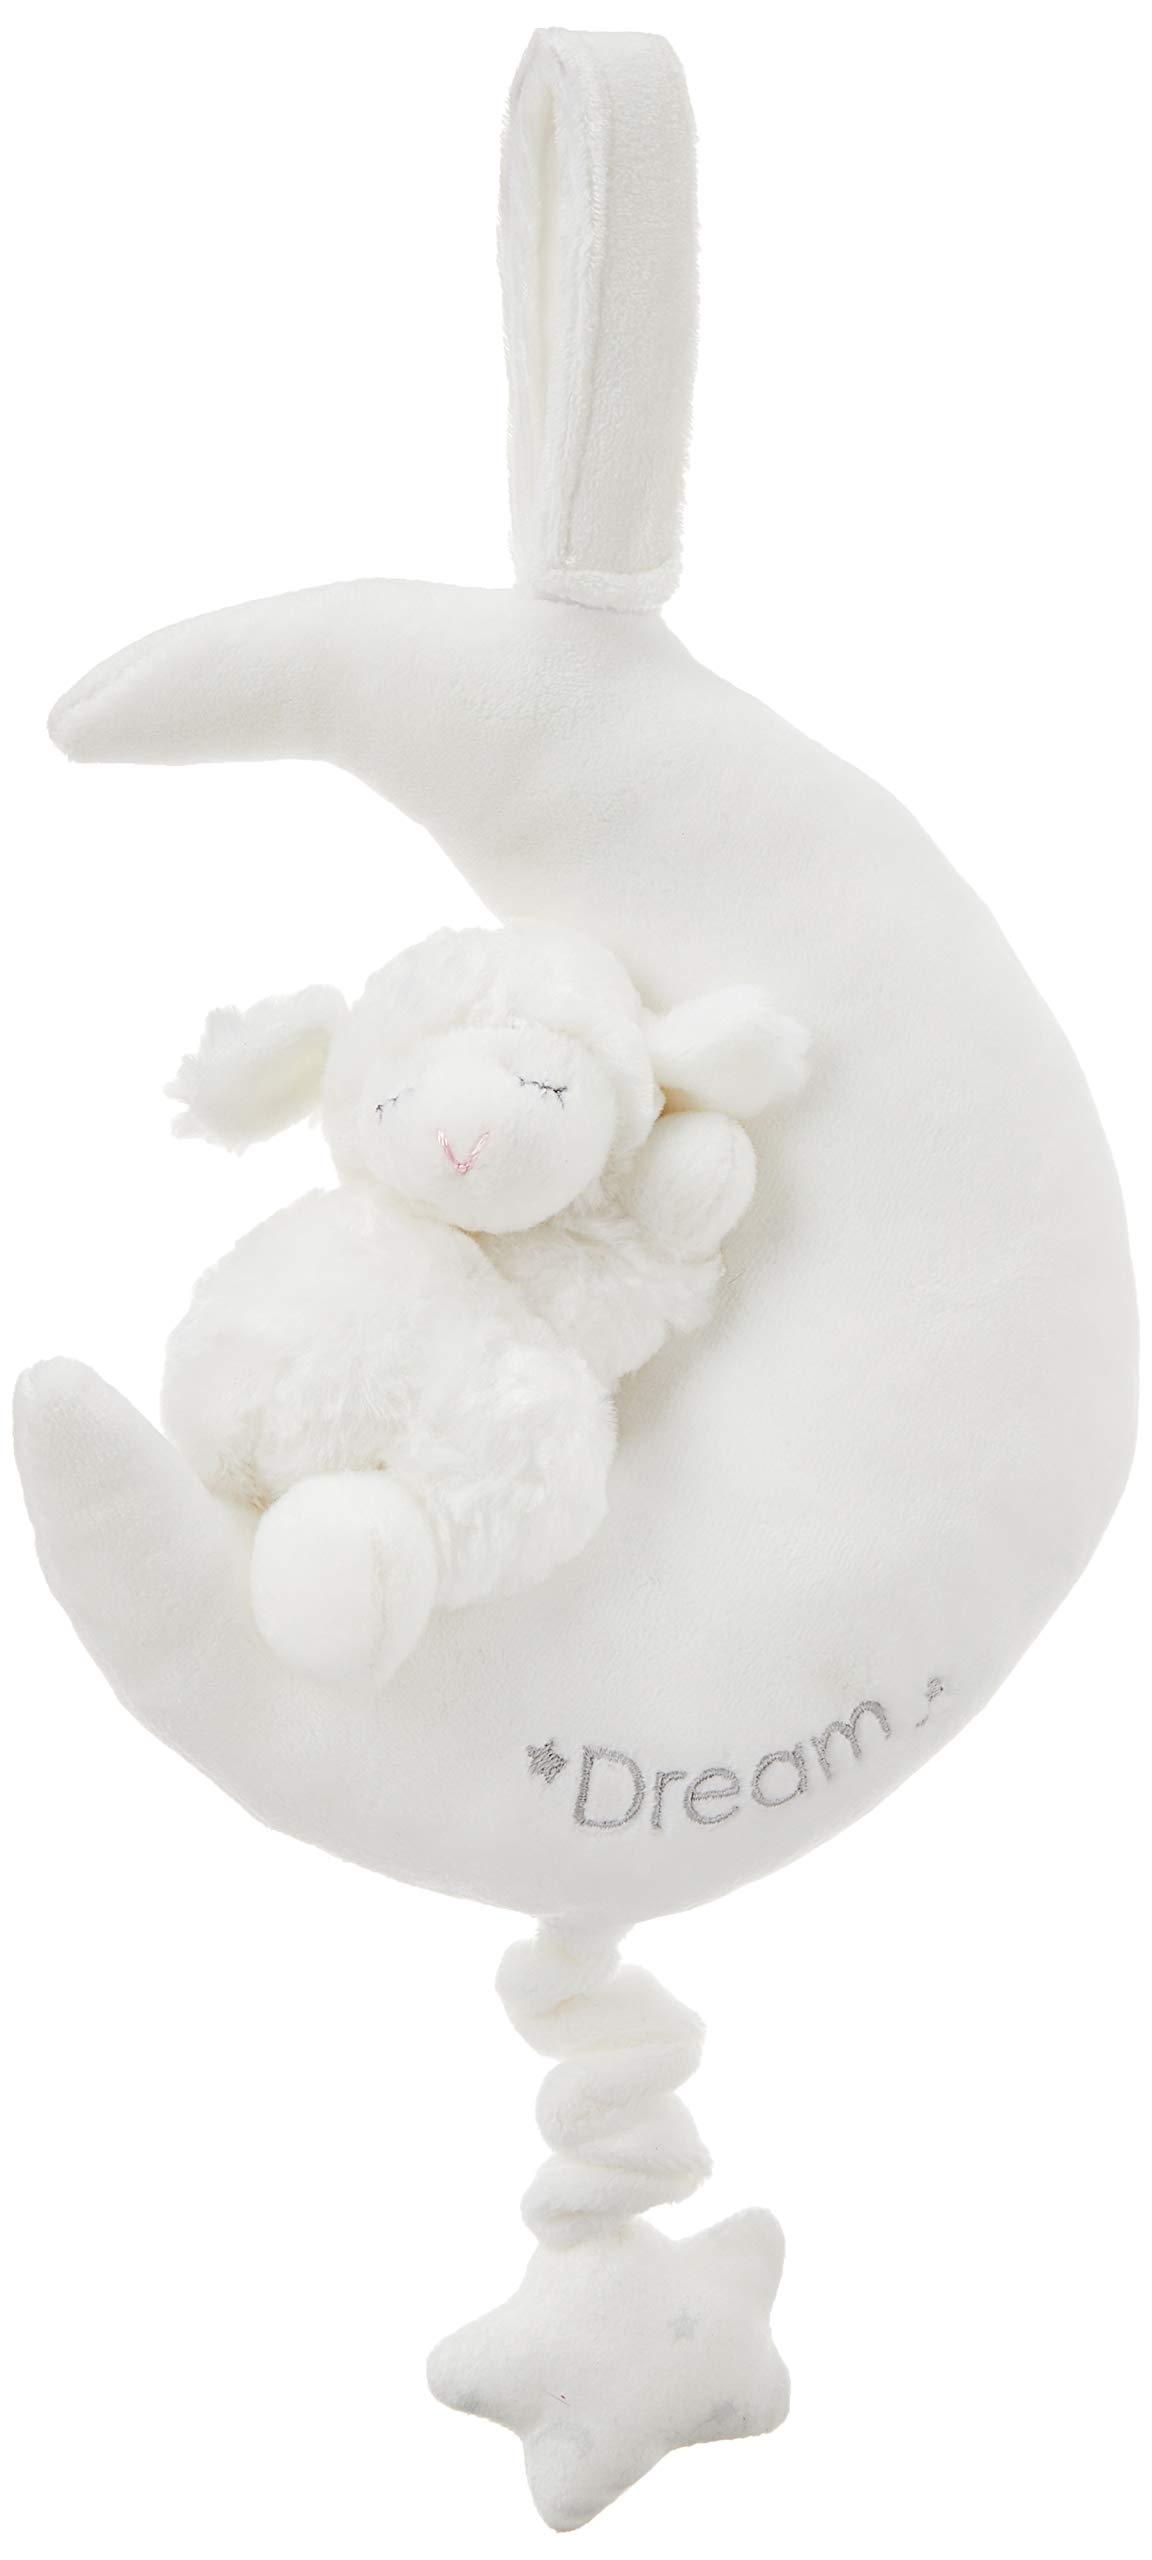 "Baby GUND Winky Lamb Moon Stuffed Animal Plush Pullstring Musical Toy, White, 9"""